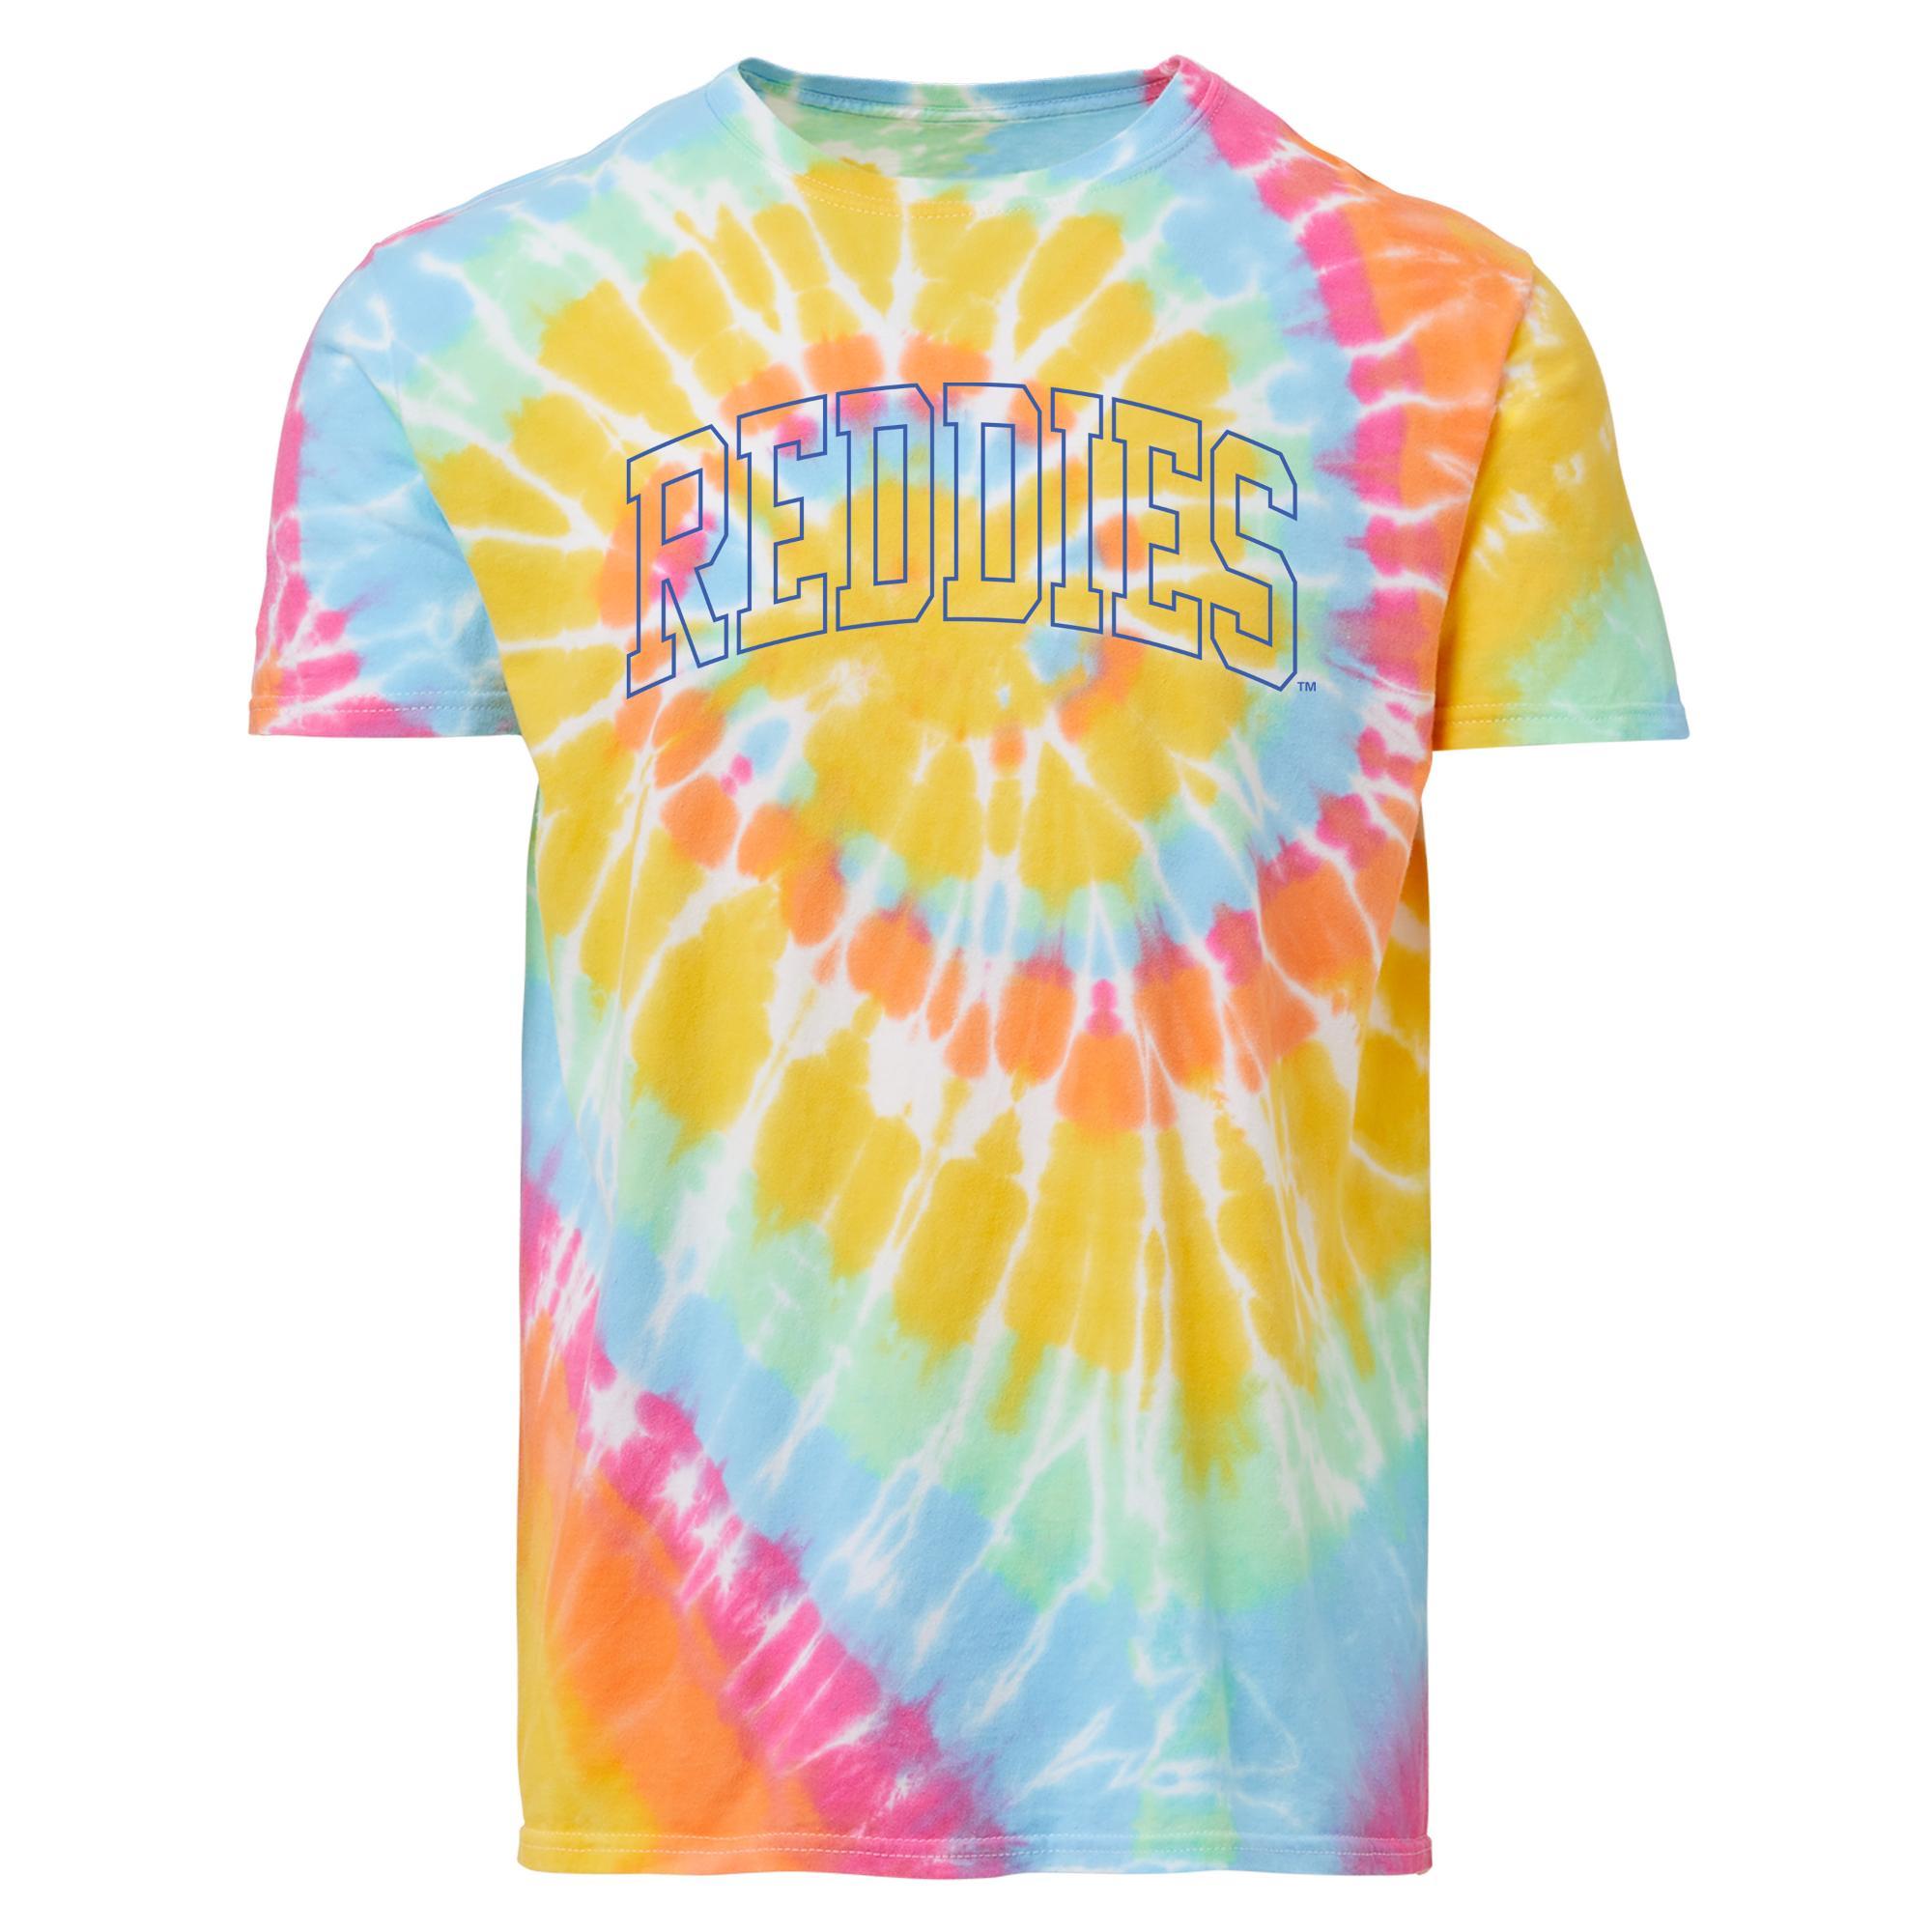 image of: Reddies Cotton Candy Swirl Crazy Short Sleeve T-Shirt